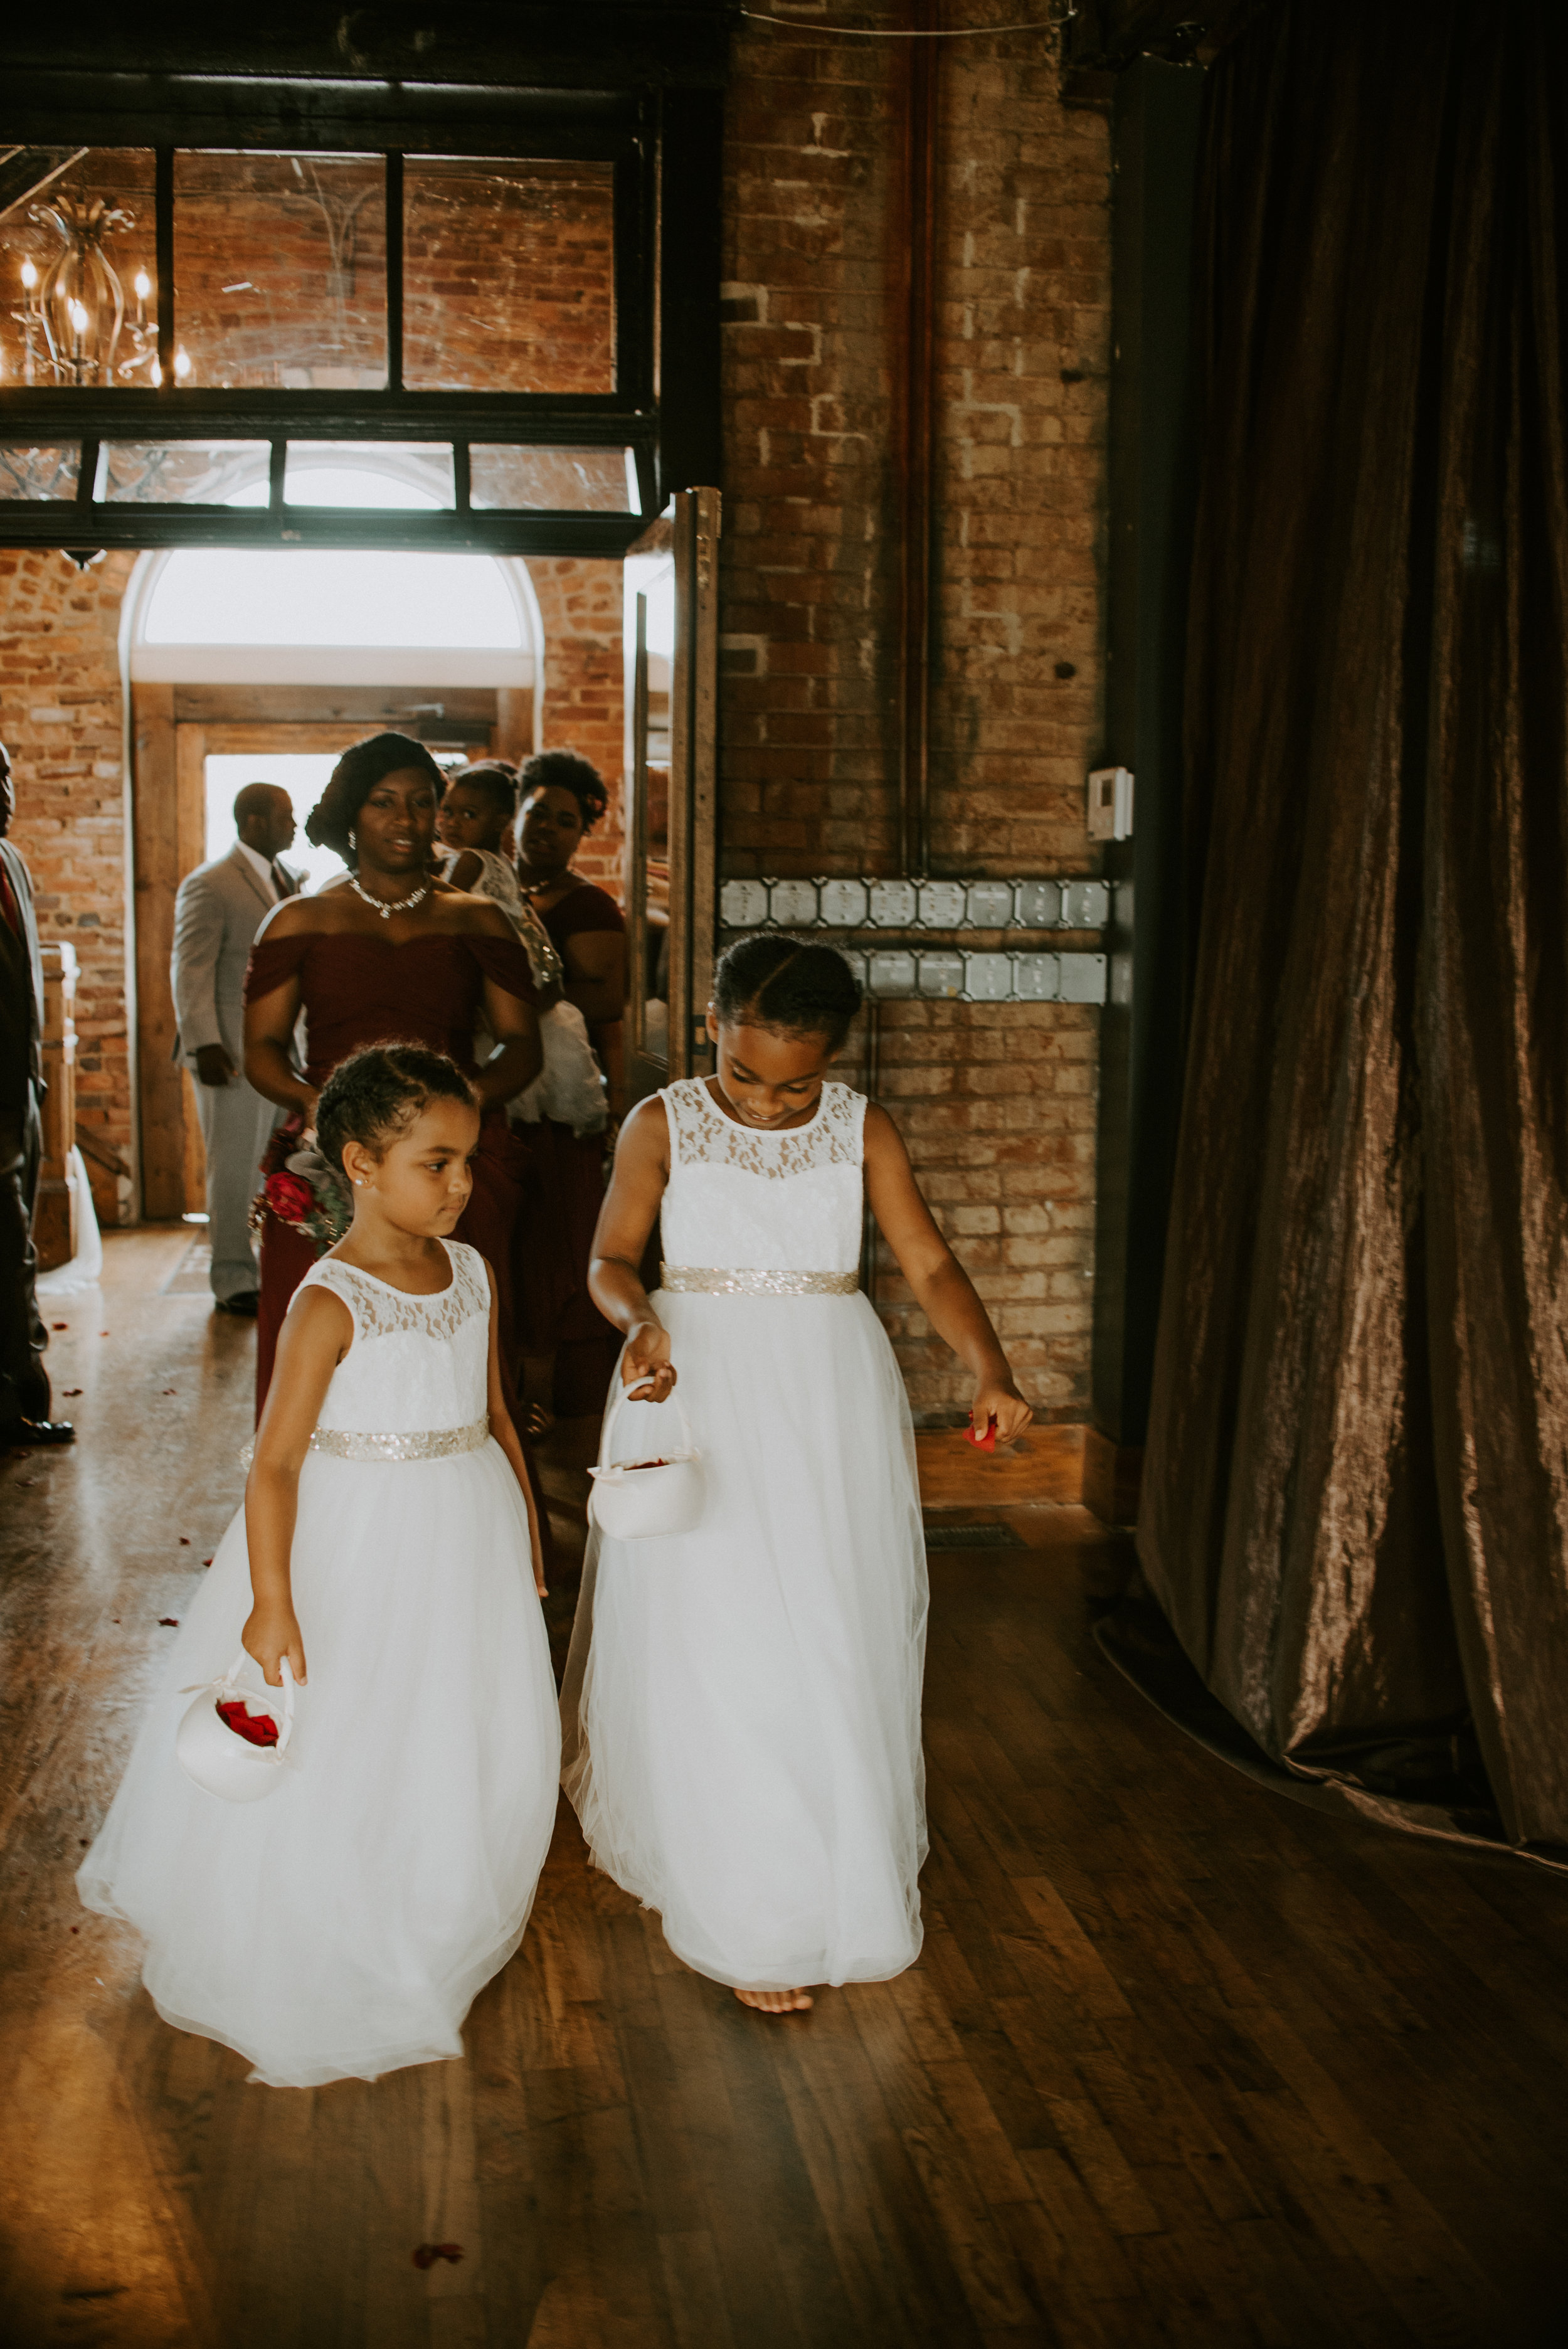 WonderlyCreative_Wedding_6.7.18_Khara&Dwayne_-813.jpg